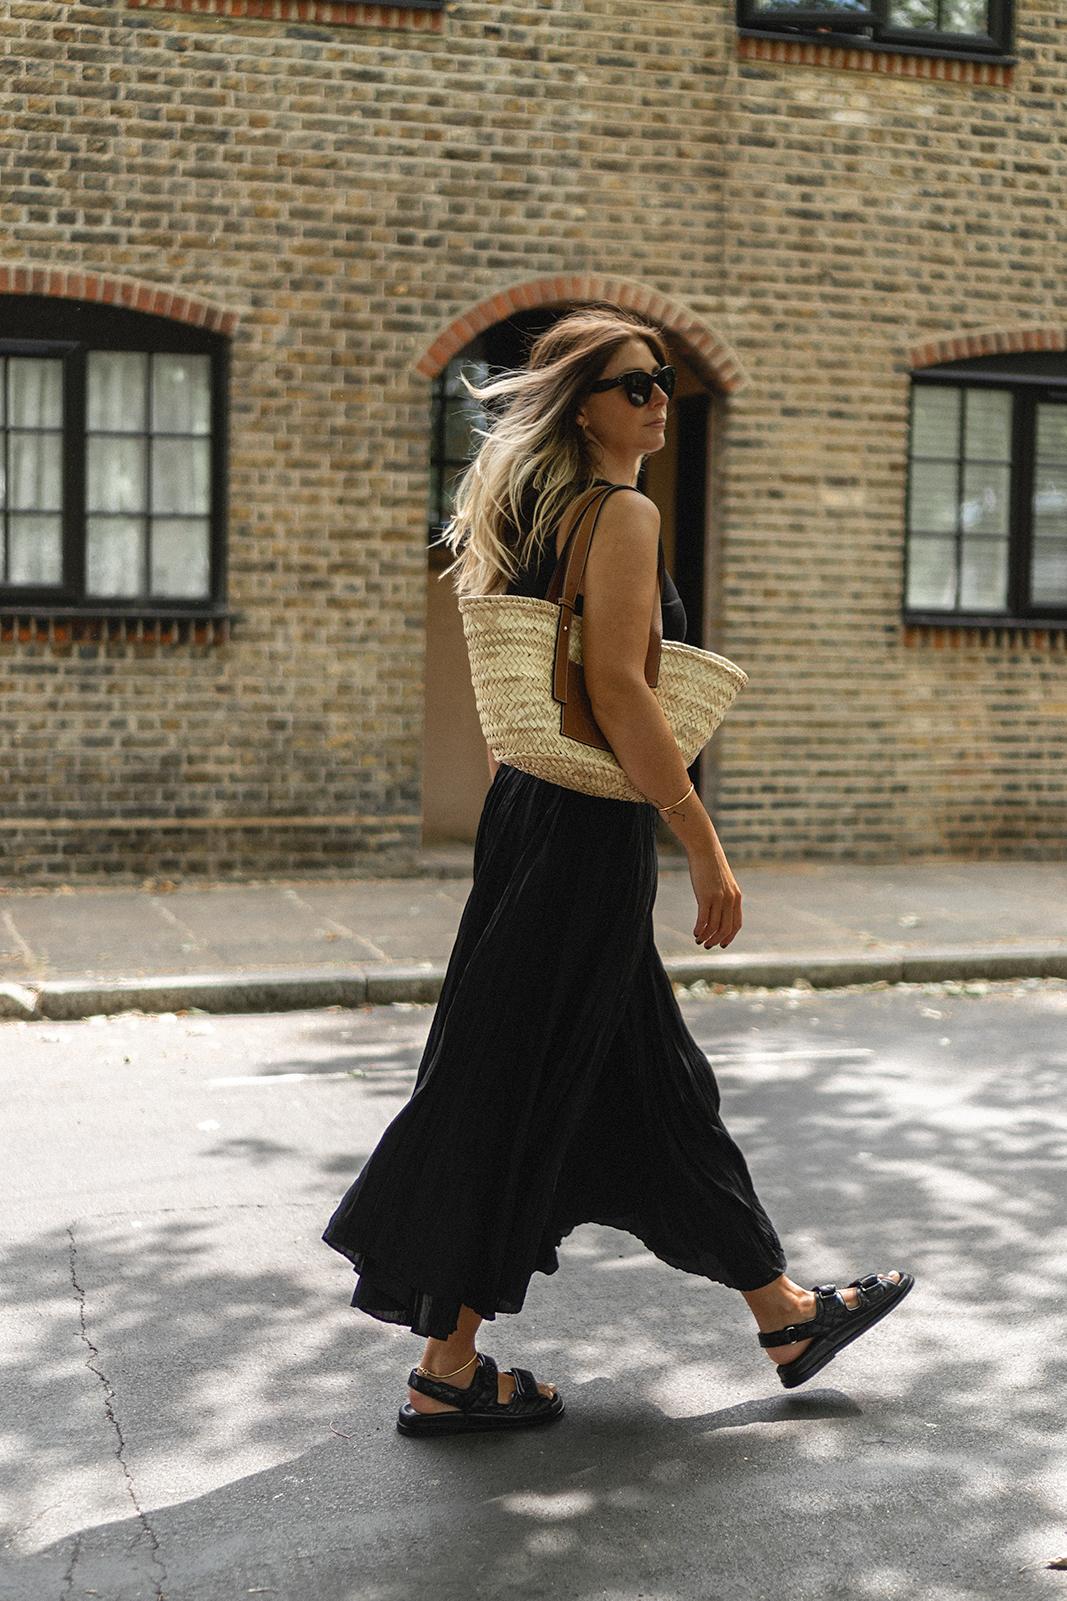 Emma Hill wears Loewe basket bag, black ribbed vest top, black crinkle silk midi skirt, black quilted leather Chanel dad sandals, Celine cat eye Baby Audrey sunglasses. Chic black Summer outfit